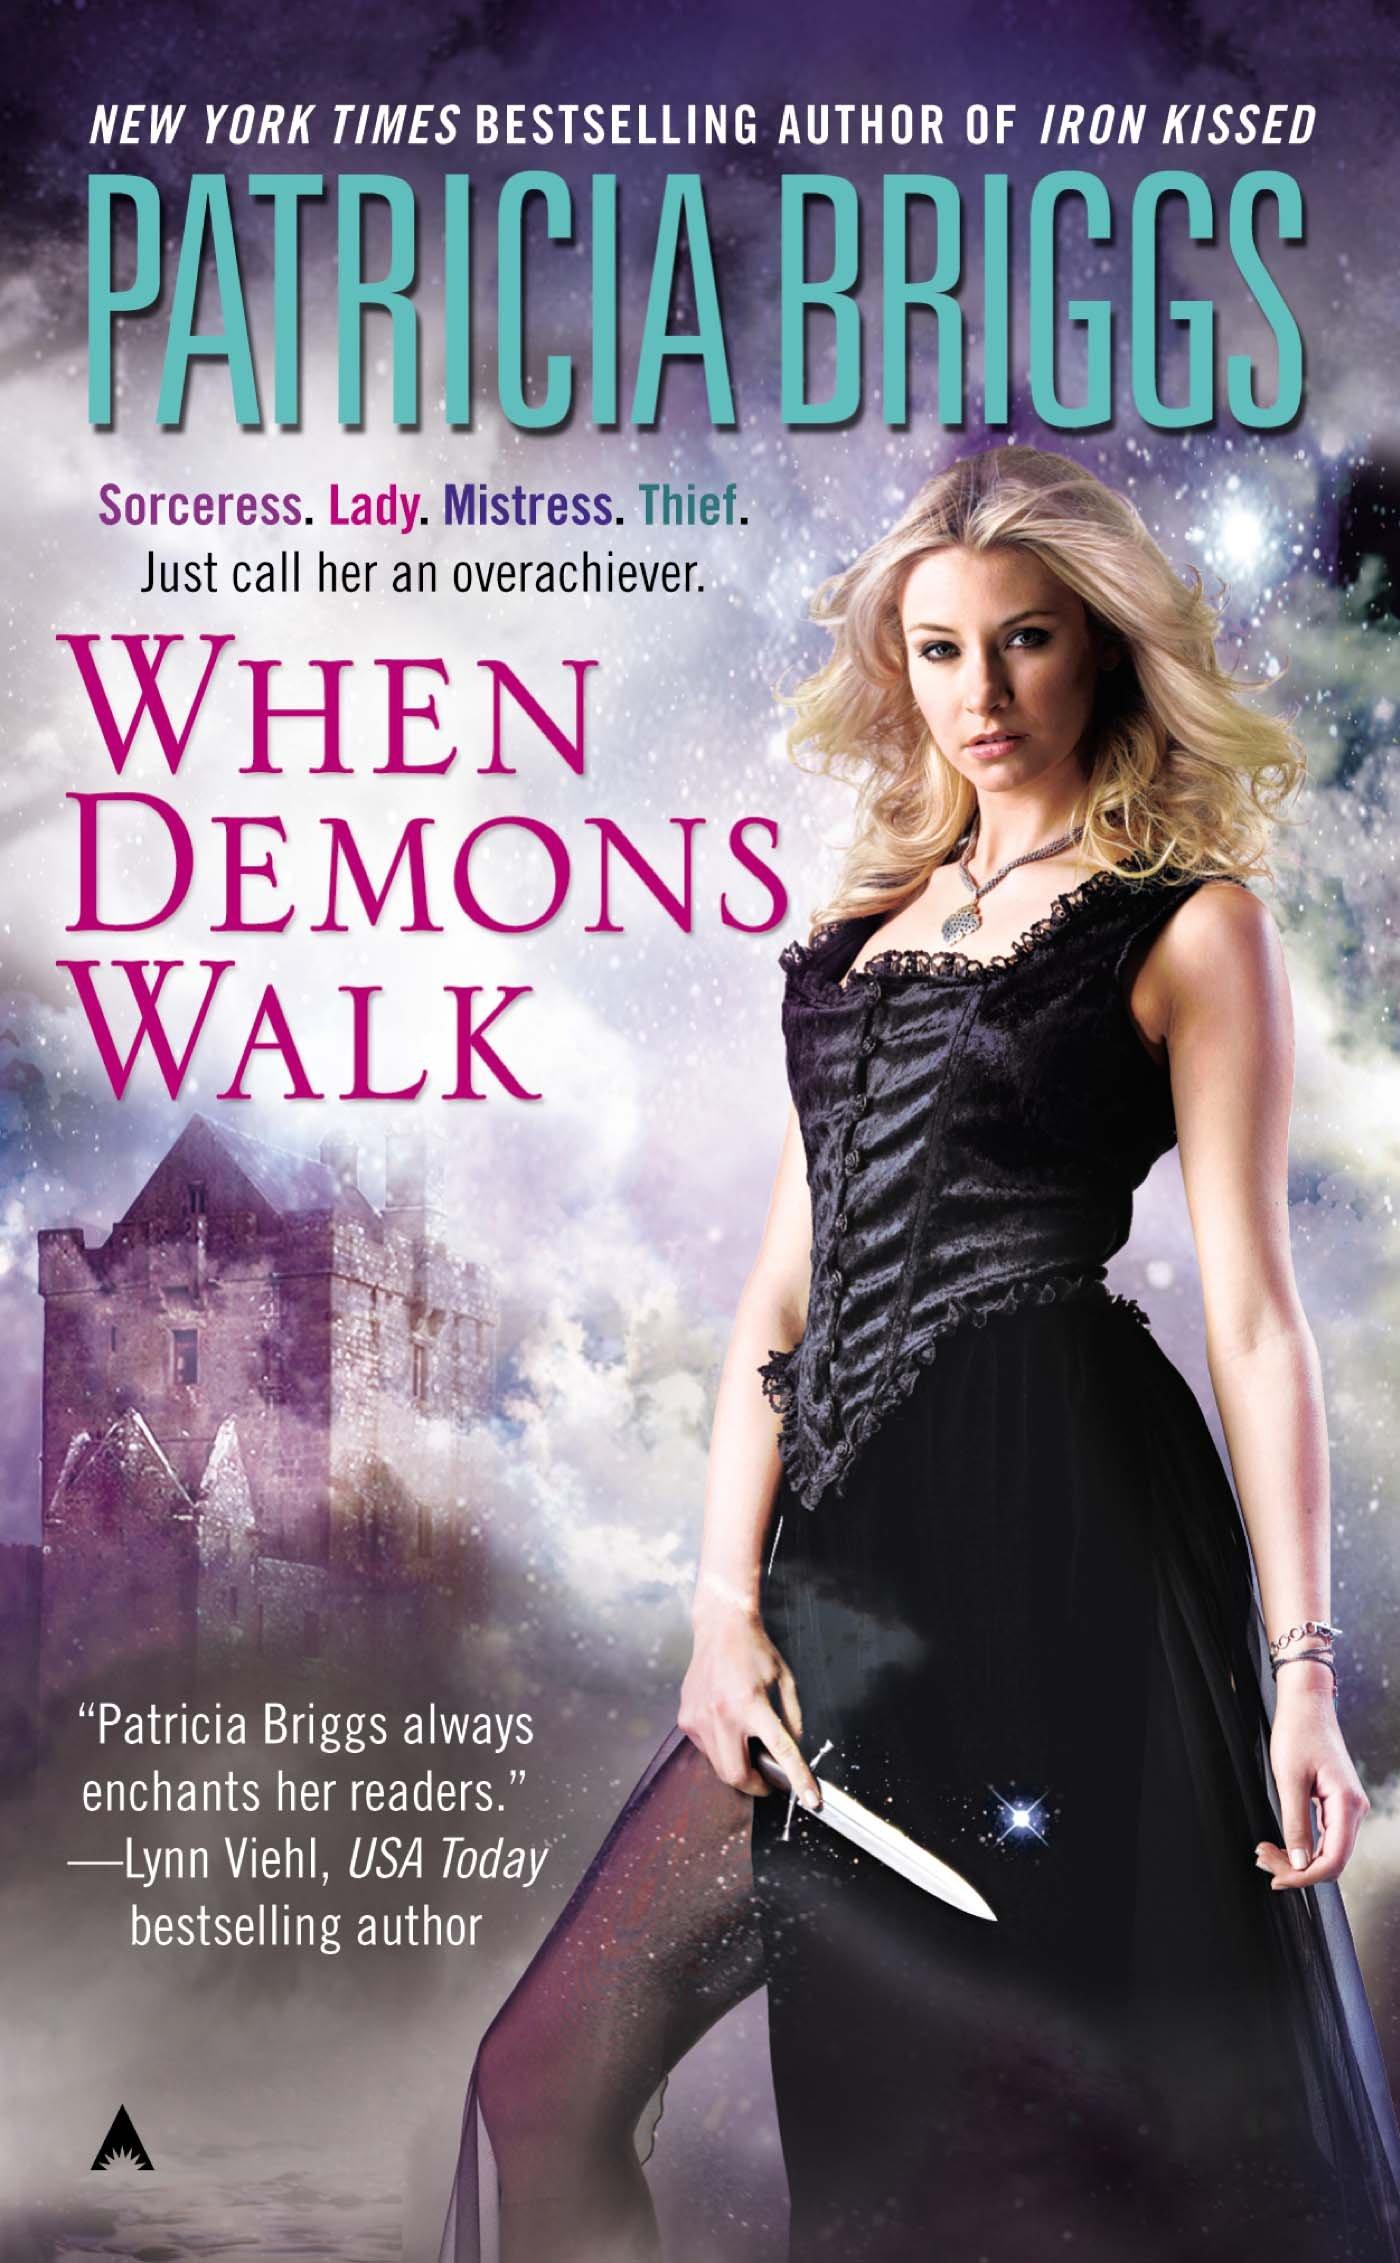 Amazon: When Demons Walk (sianim Series) (9780441005345): Patricia Briggs: